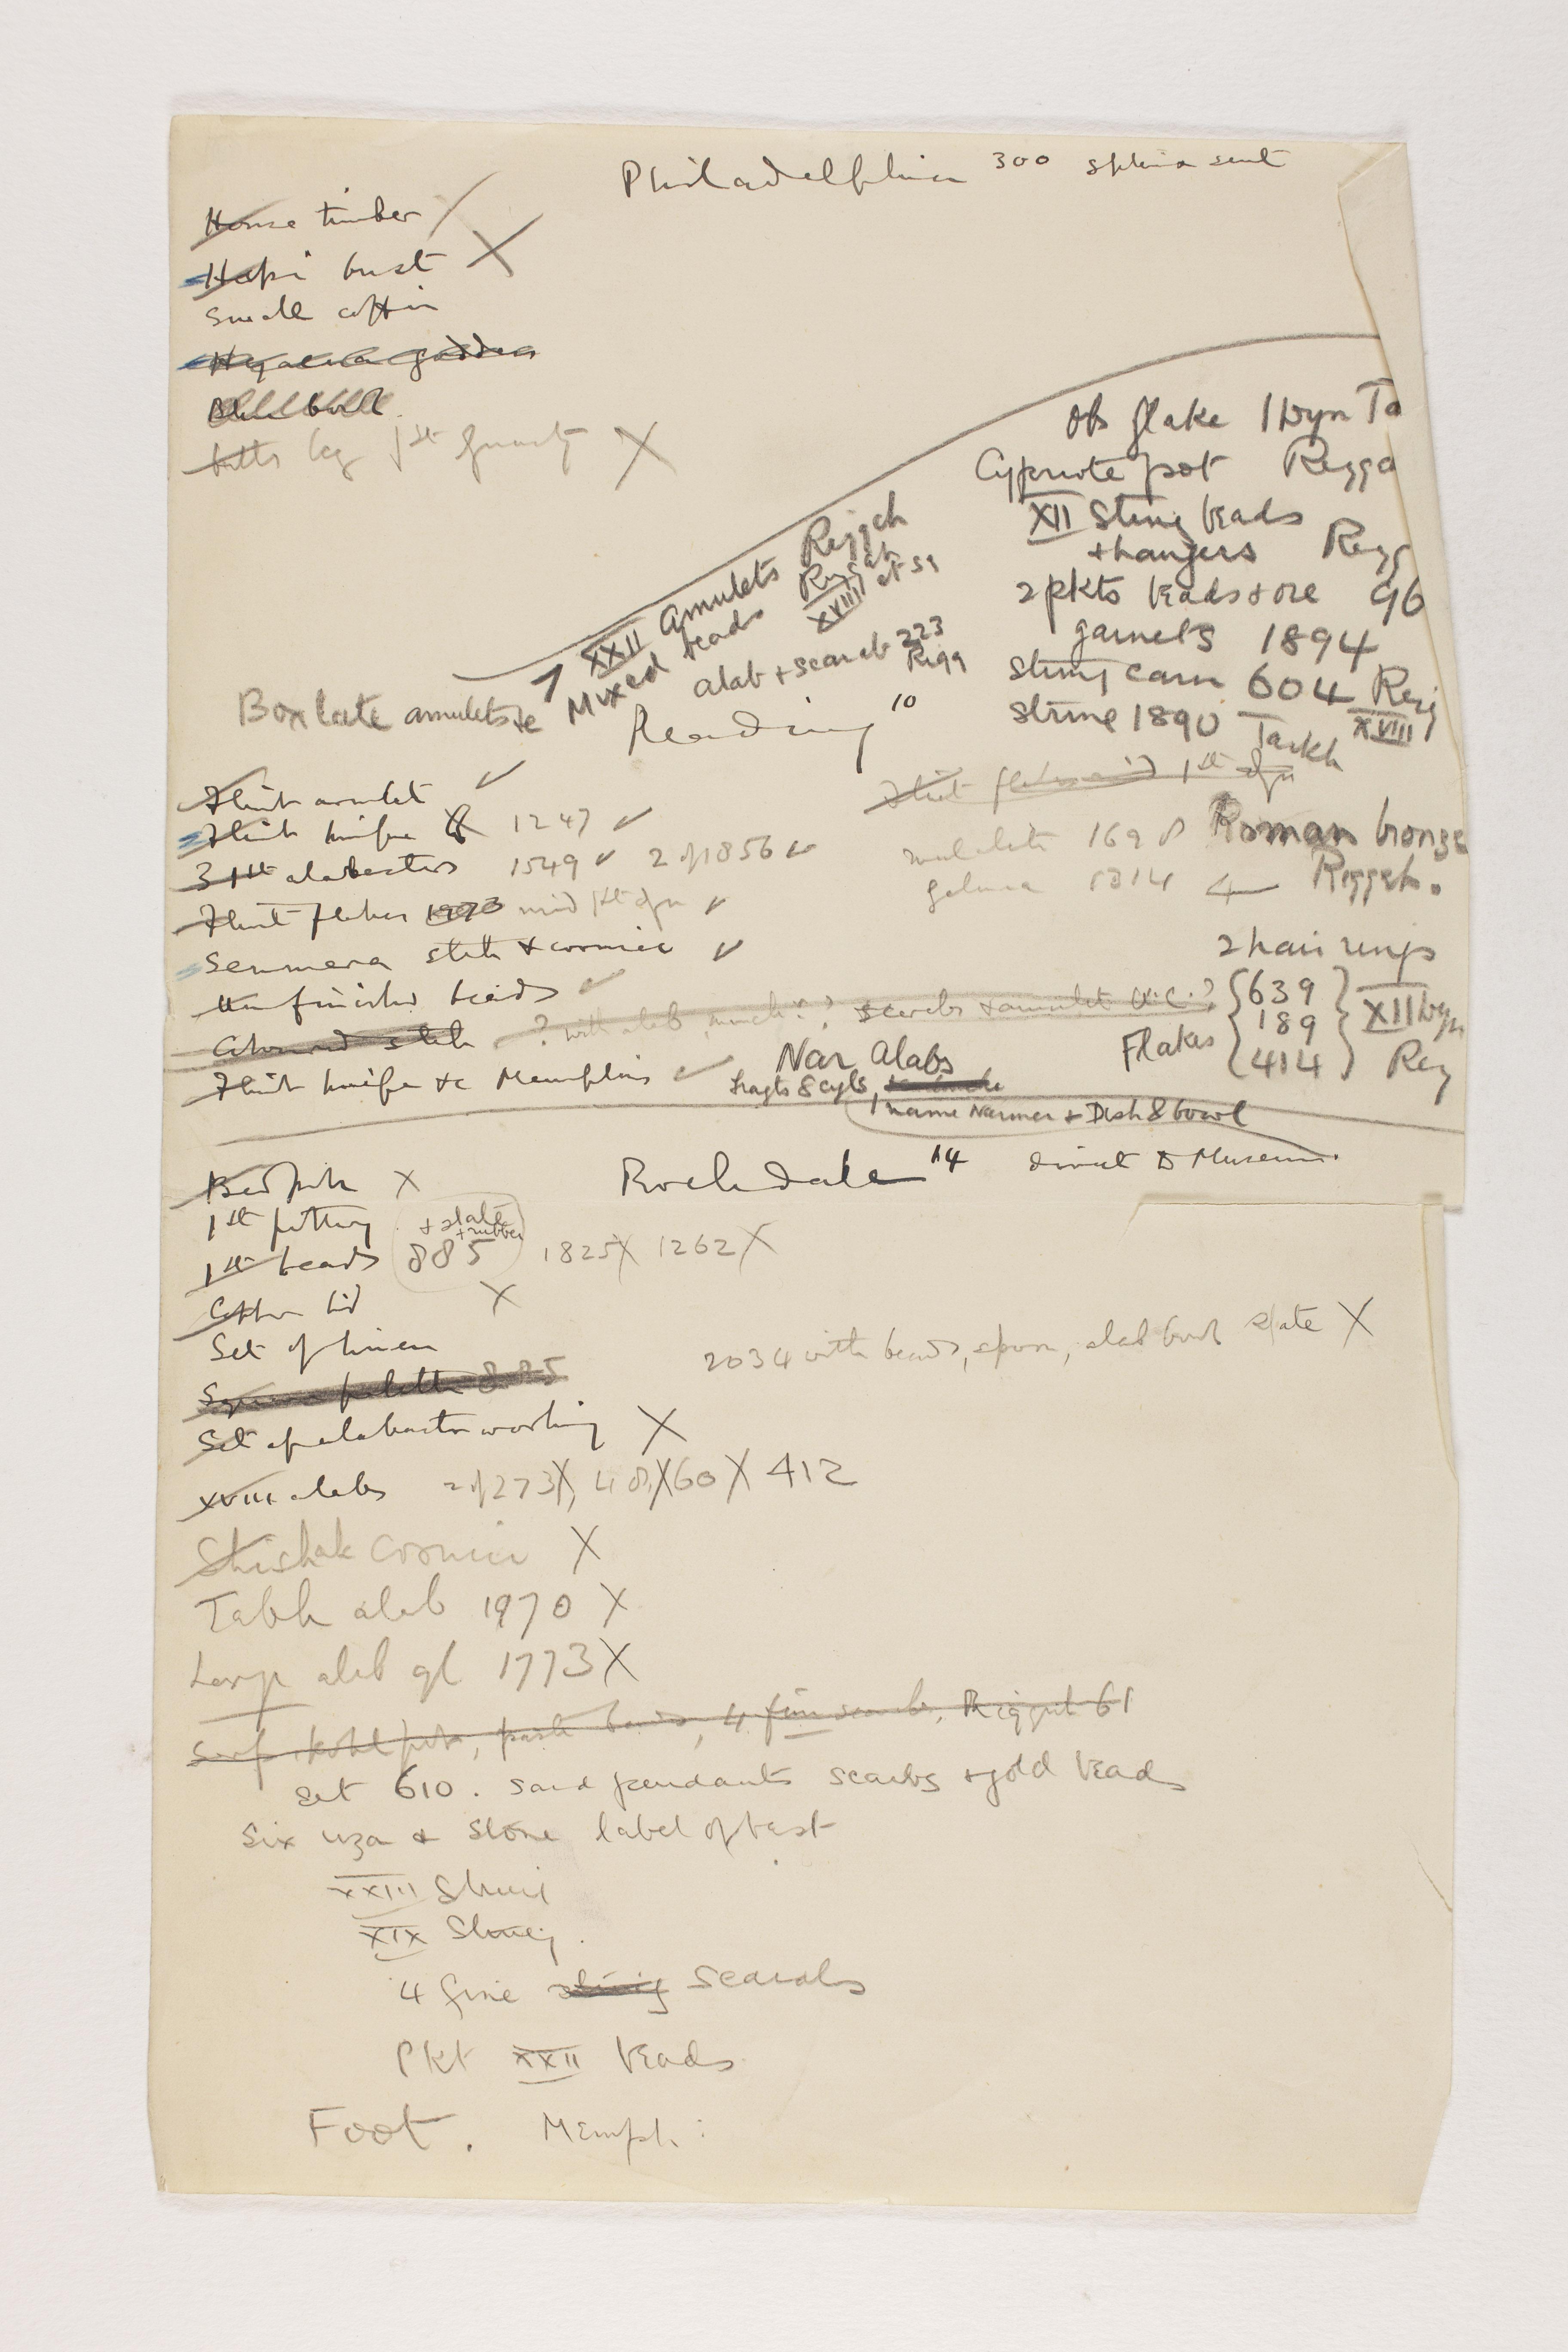 1912-13 Tarkhan, el-Riqqa, Memphis Multiple institution list PMA/WFP1/D/21/14